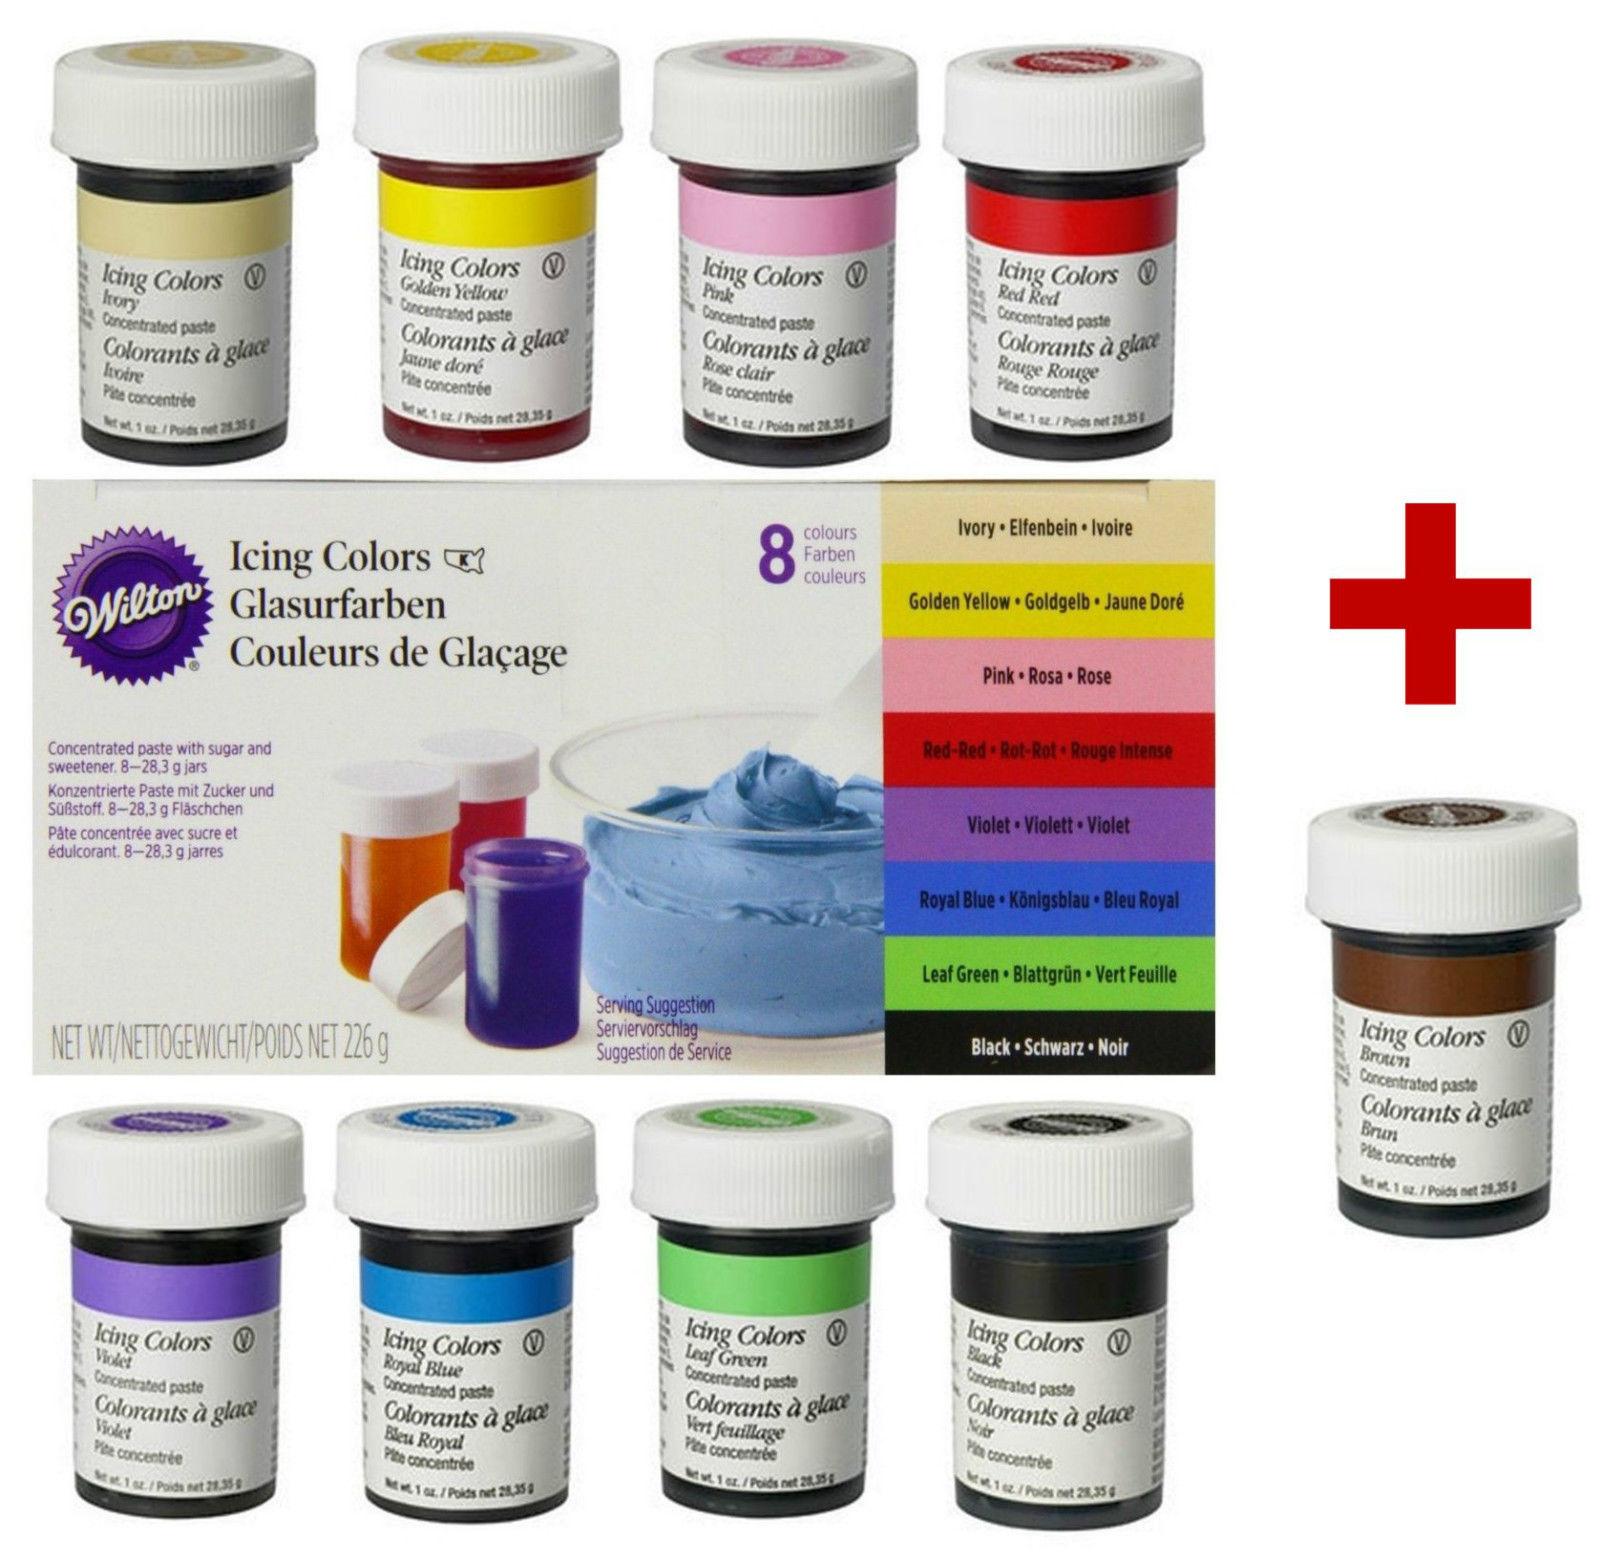 Wilton Icing Colors Lebensmittelfarbe 8 + 1 Gelfarben für Fondant braun